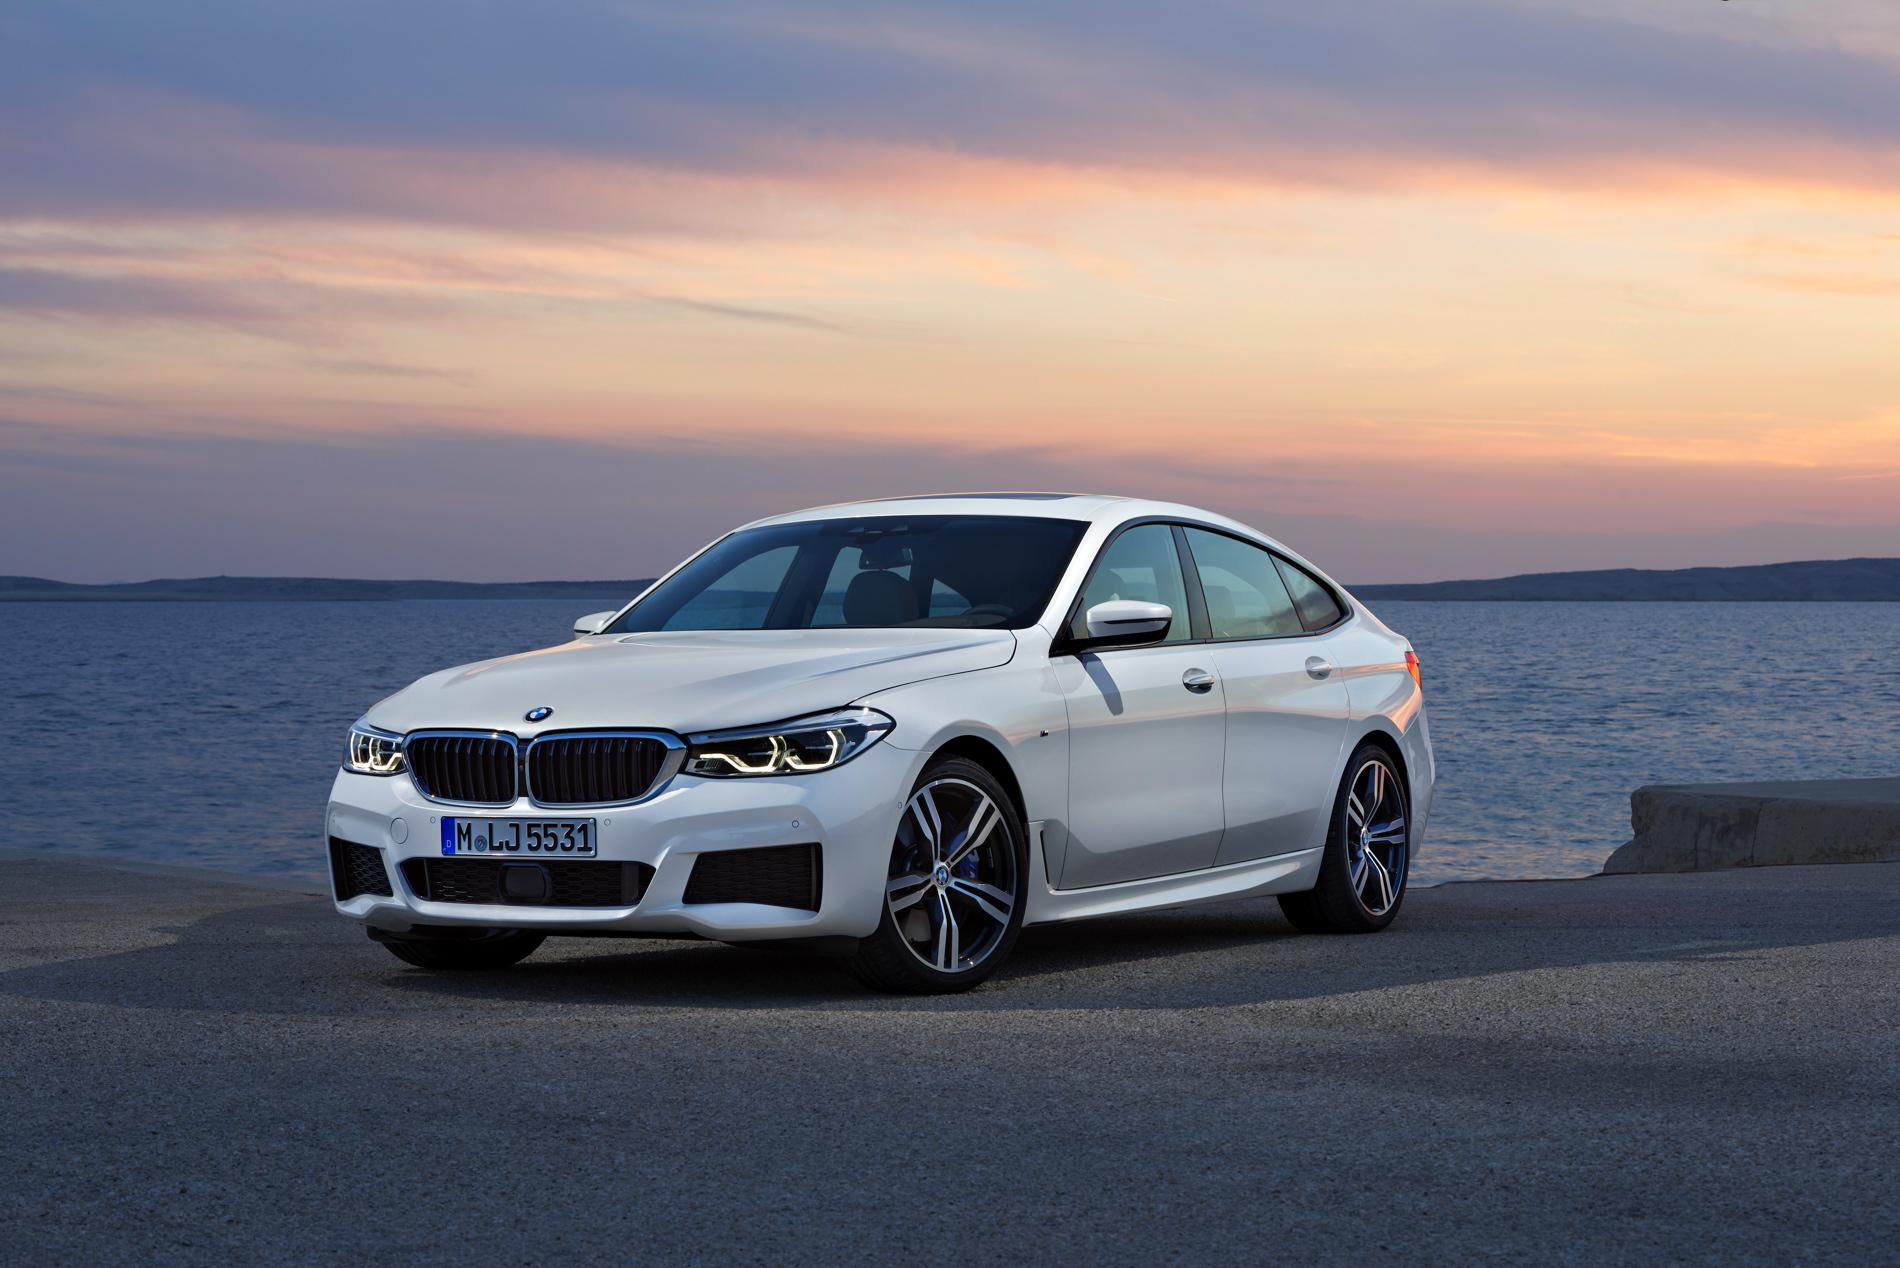 New BMW 6 Series Gran Turismo 36